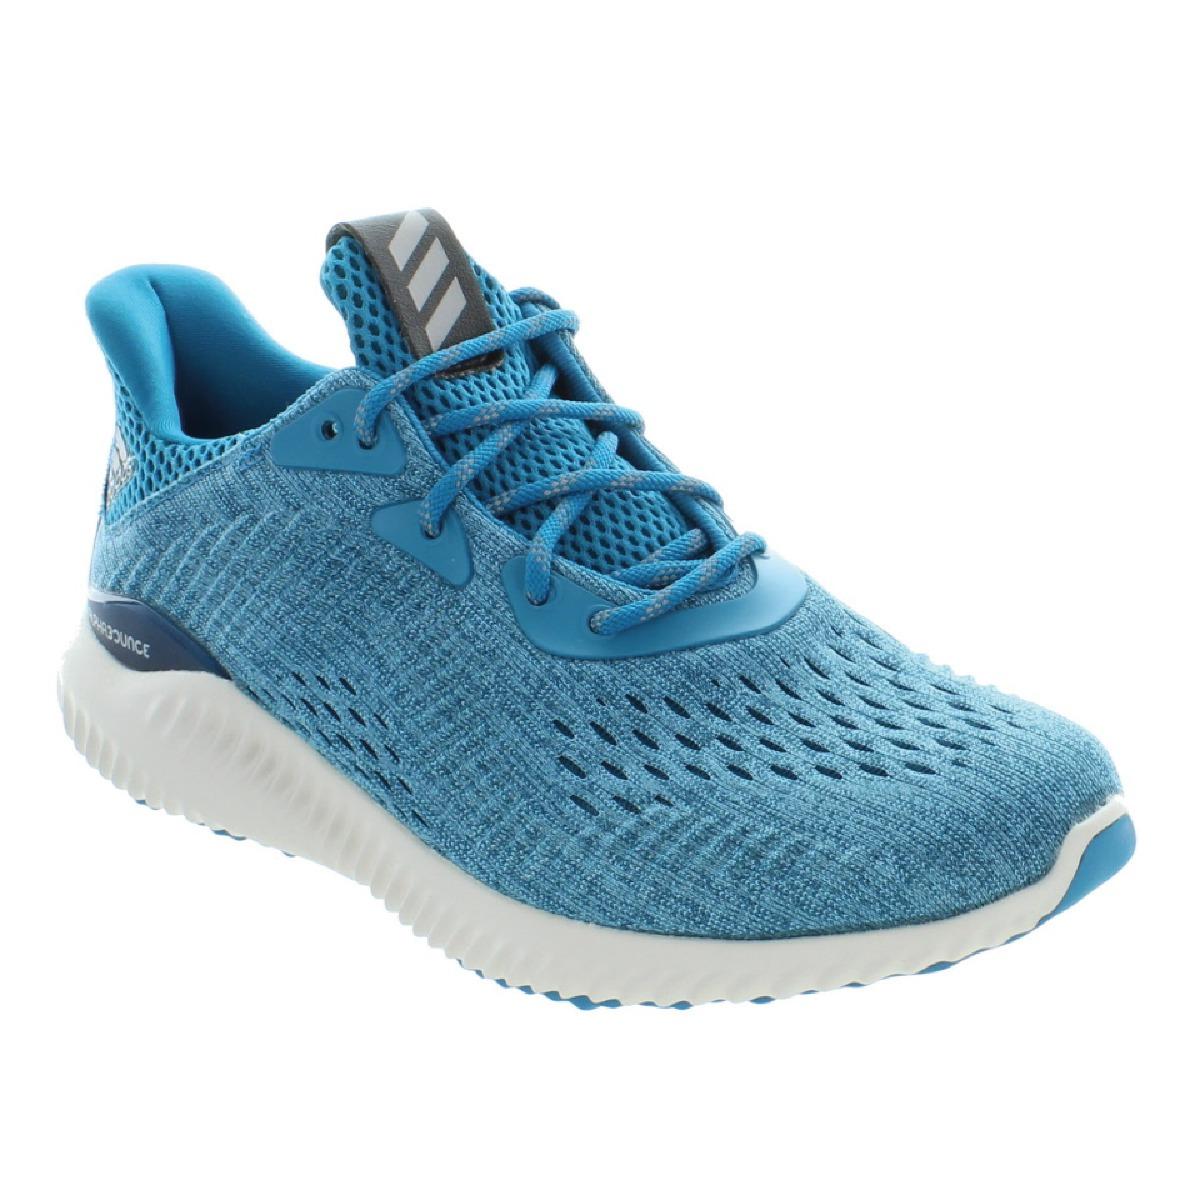 Tenis adidas Alphabounce Em Nuevo Mujer Azul Turquesa Nuevo Em Bw1120 b311a5